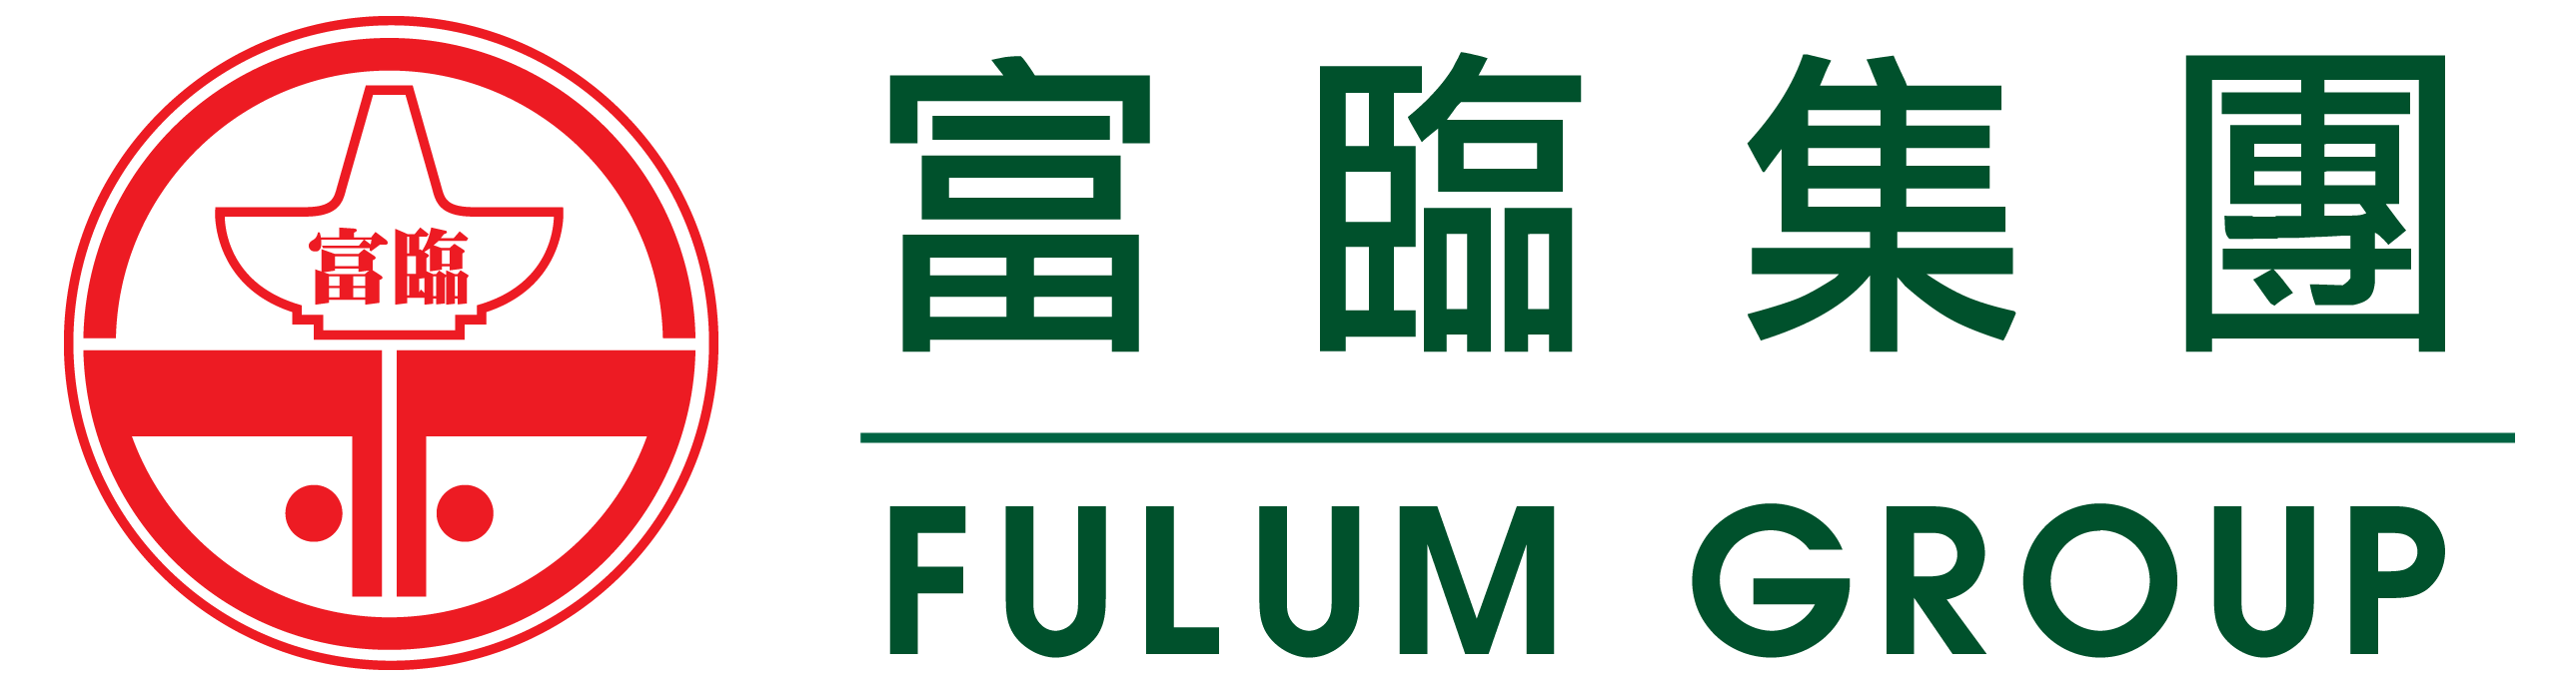 Fulum Group